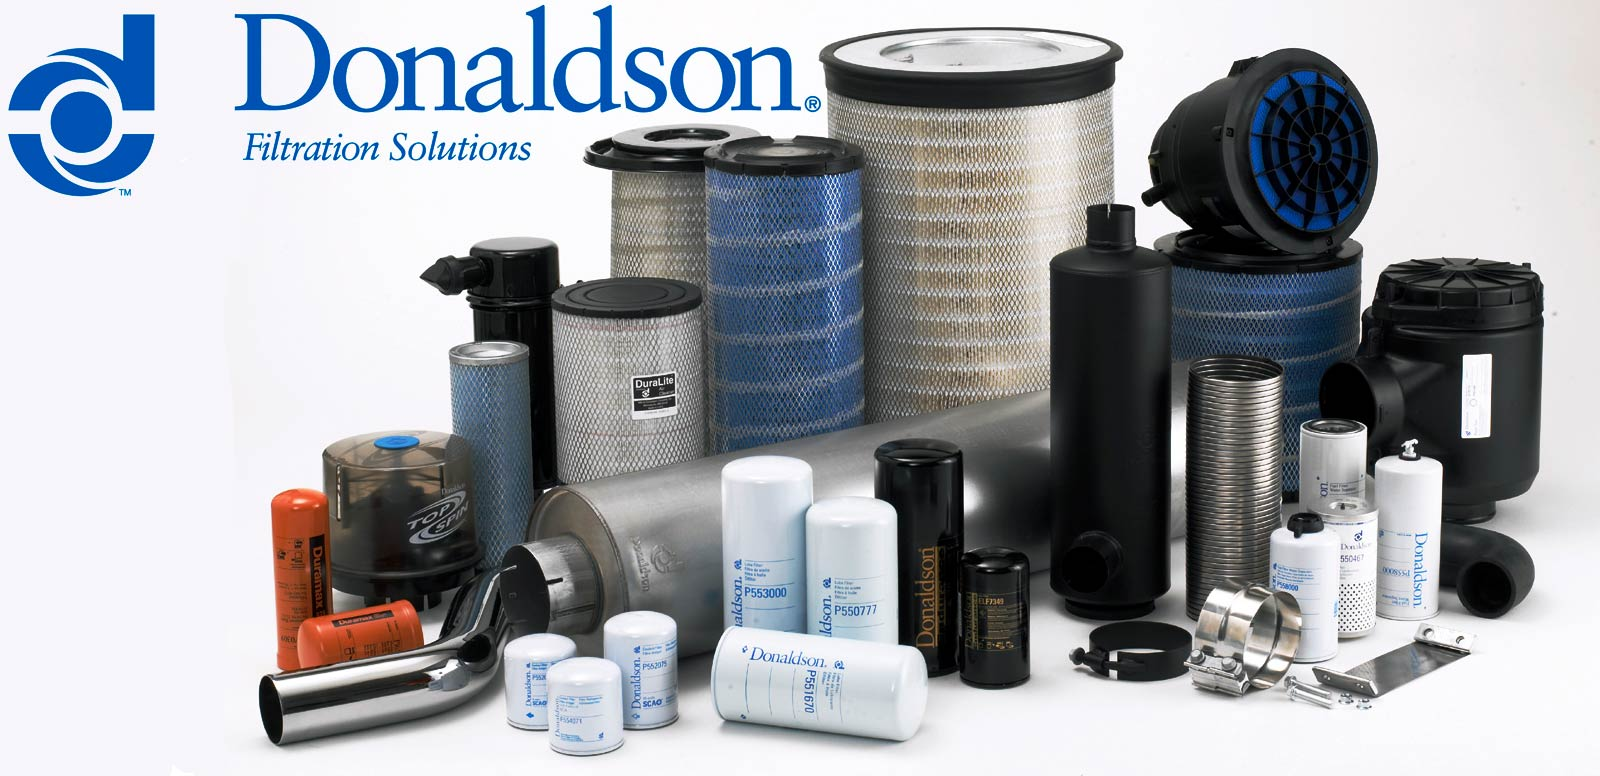 donaldson-3